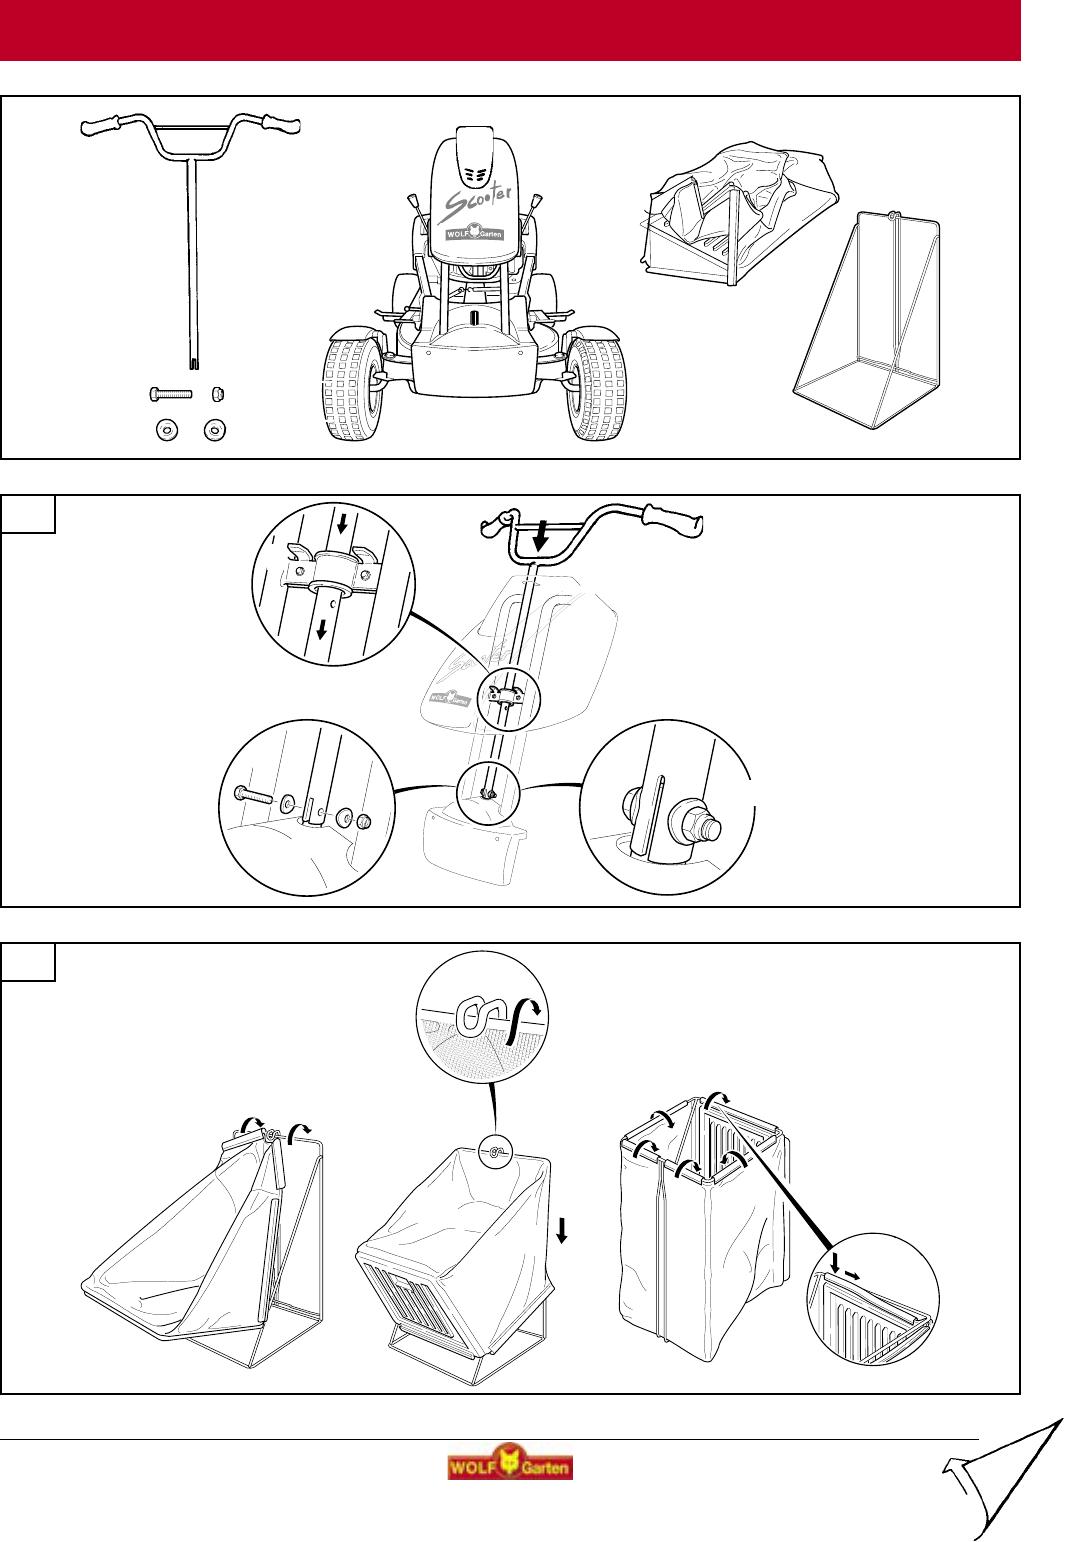 Handleiding WOLF-Garten SV 4 (pagina 13 van 42) (Deutsch